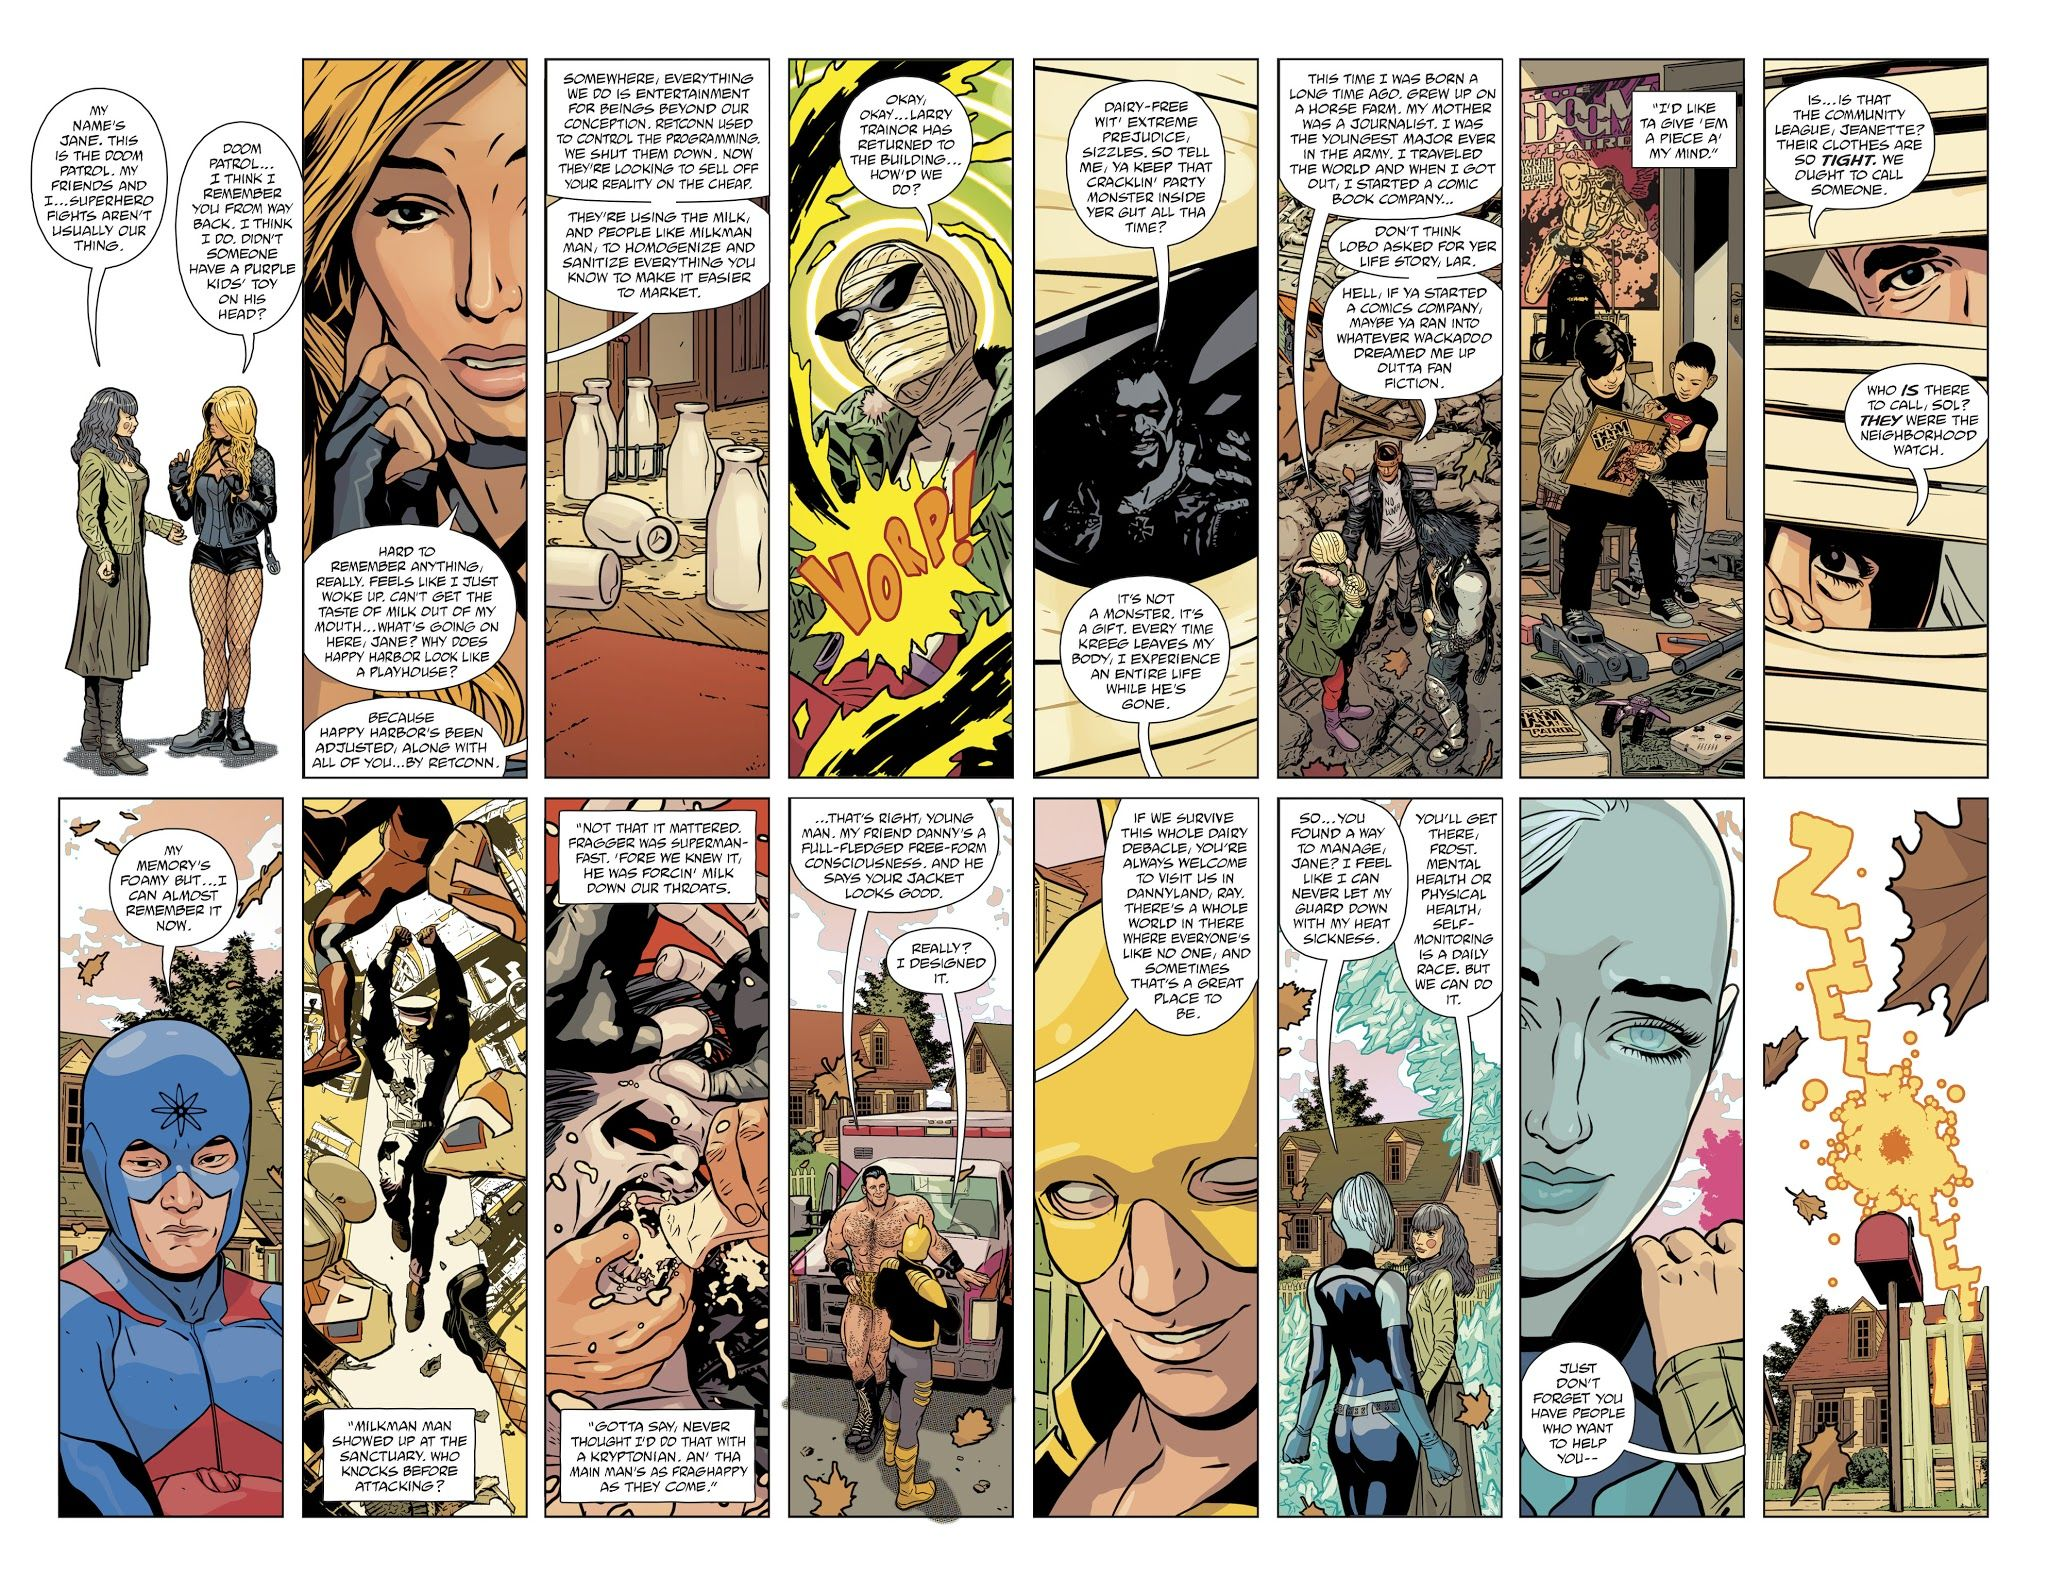 Jla Doom Patrol Special Full Read Jla Doom Patrol Special Full Comic Online In High Quality Doom Patrol Comics Comics Online